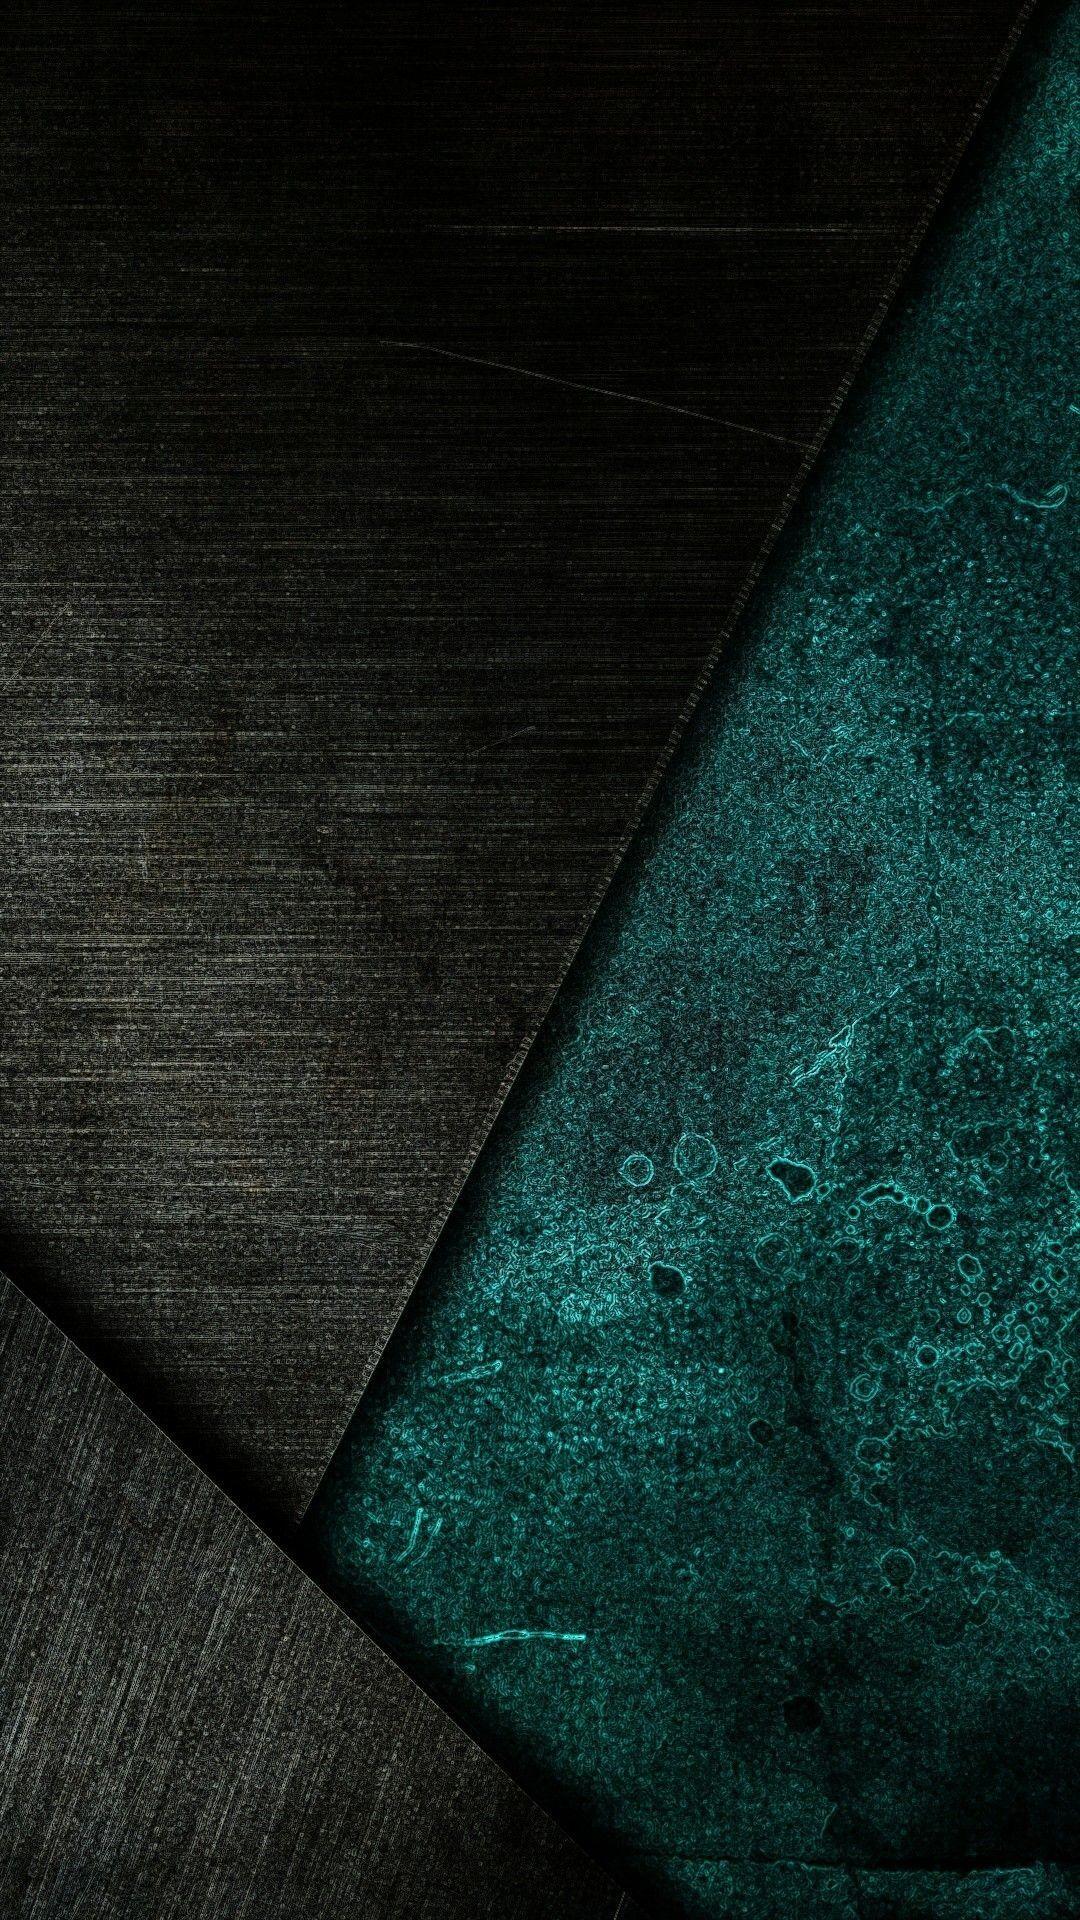 73 Black Mobile Wallpapers On Wallpaperplay Dark Wallpaper Black Hd Wallpaper Hd Cool Wallpapers